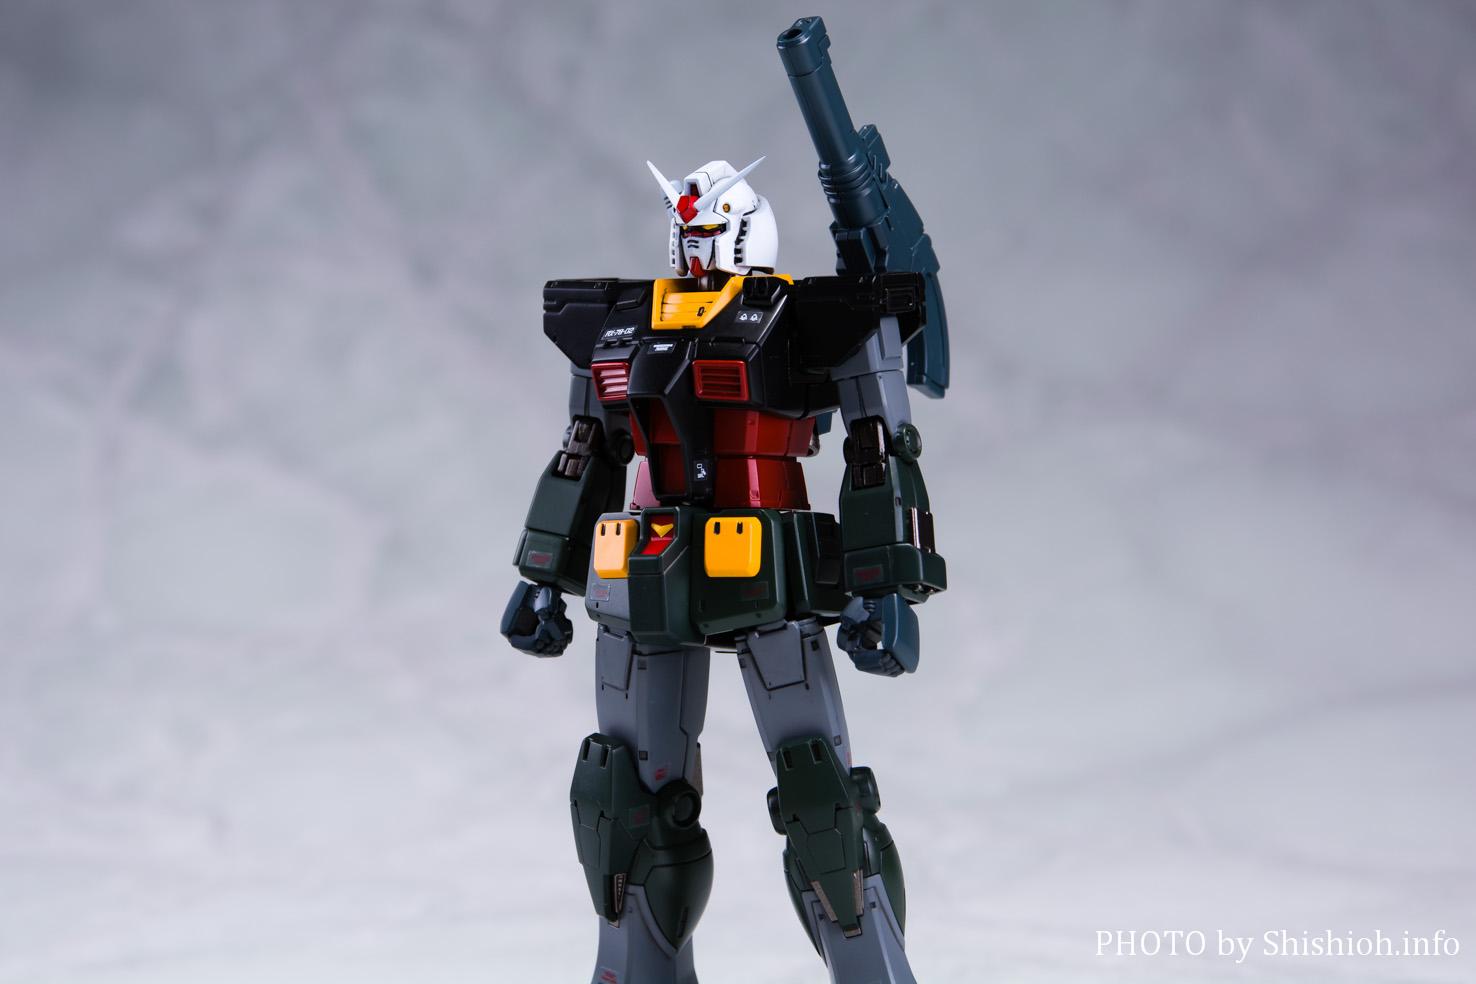 HG 1/144 RX-78-02 ガンダム(GUNDAM THE ORIGIN版)